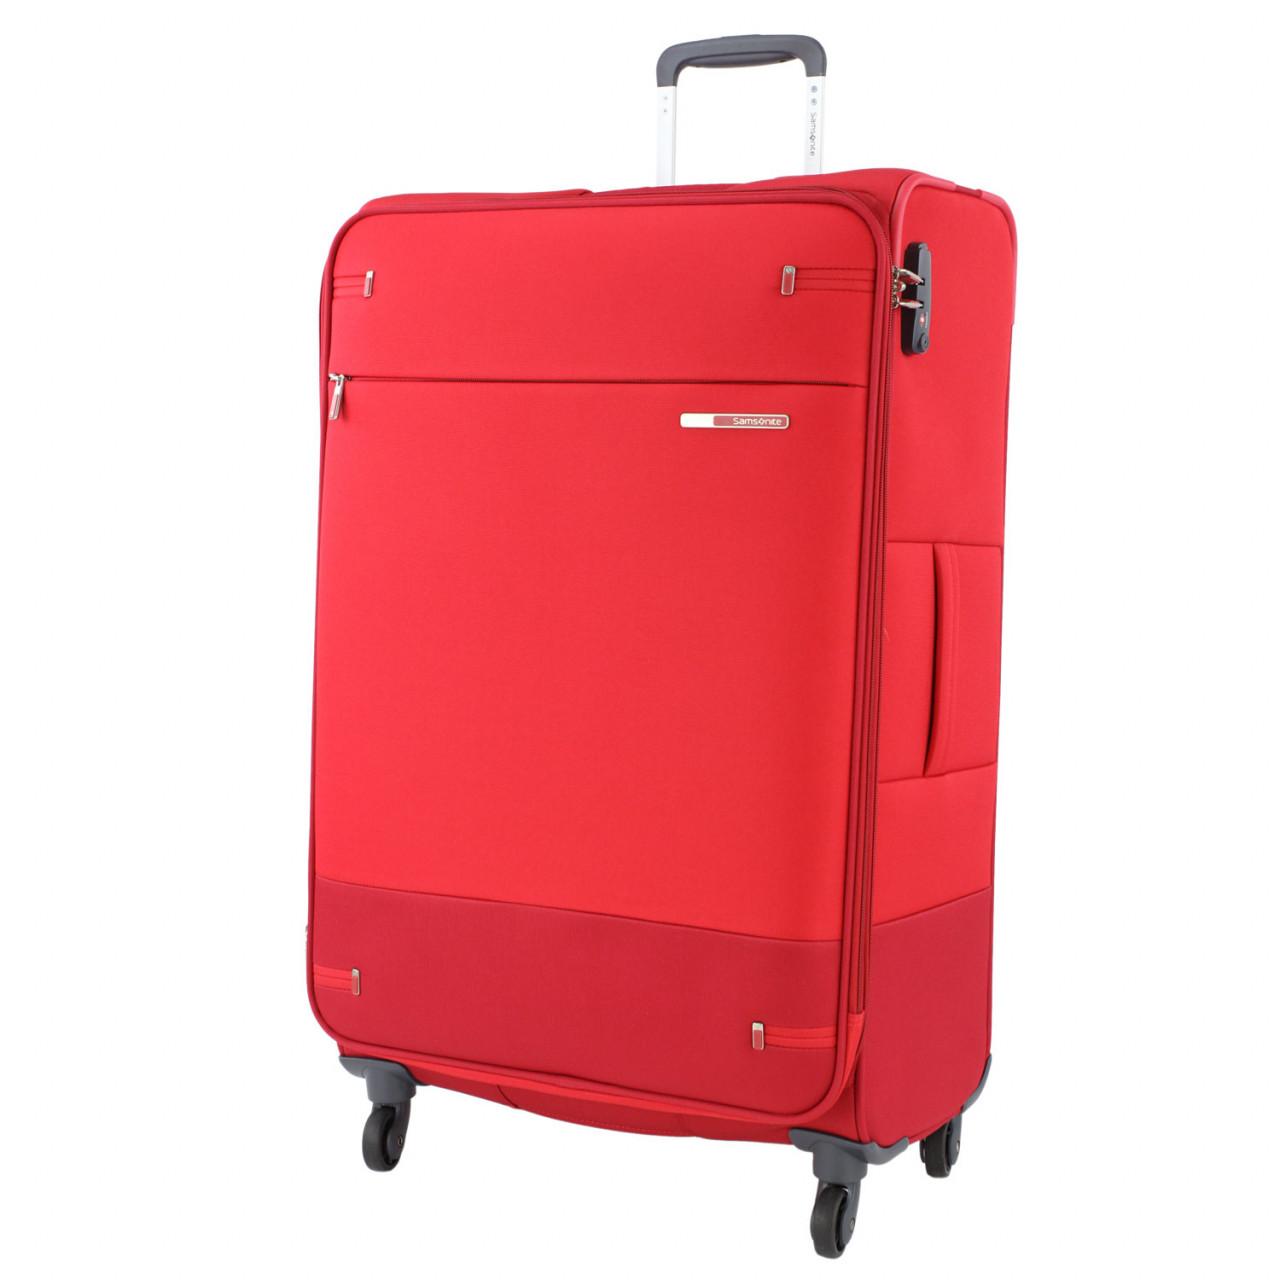 Samsonite Spinner 78/29 EXP 4 Rollen Koffer Base Boost red